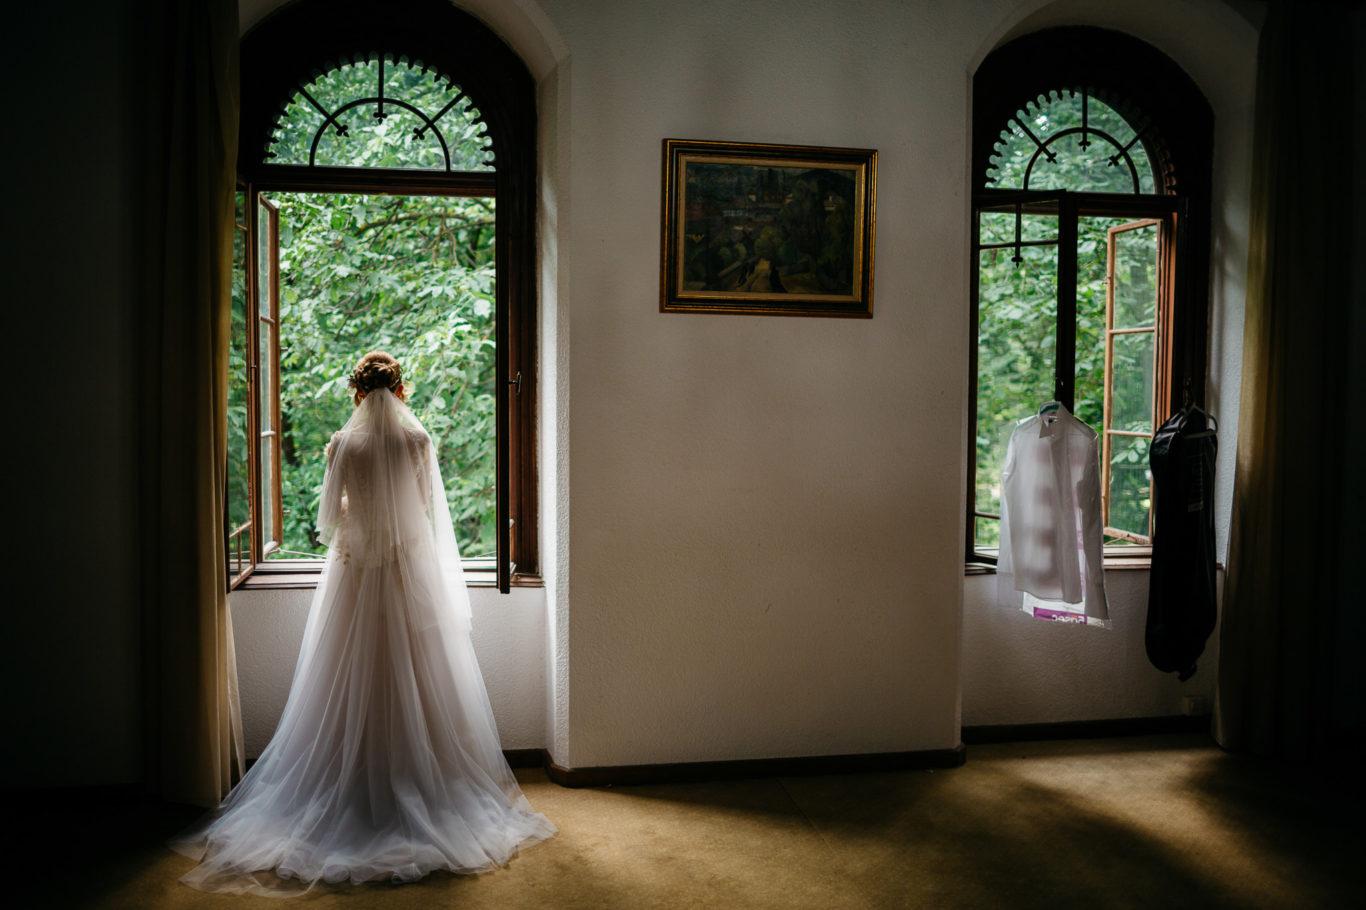 0121-Fotografie-nunta-Stirbey-Laura-Rares-fotograf-Ciprian-Dumitrescu-DCF_3234